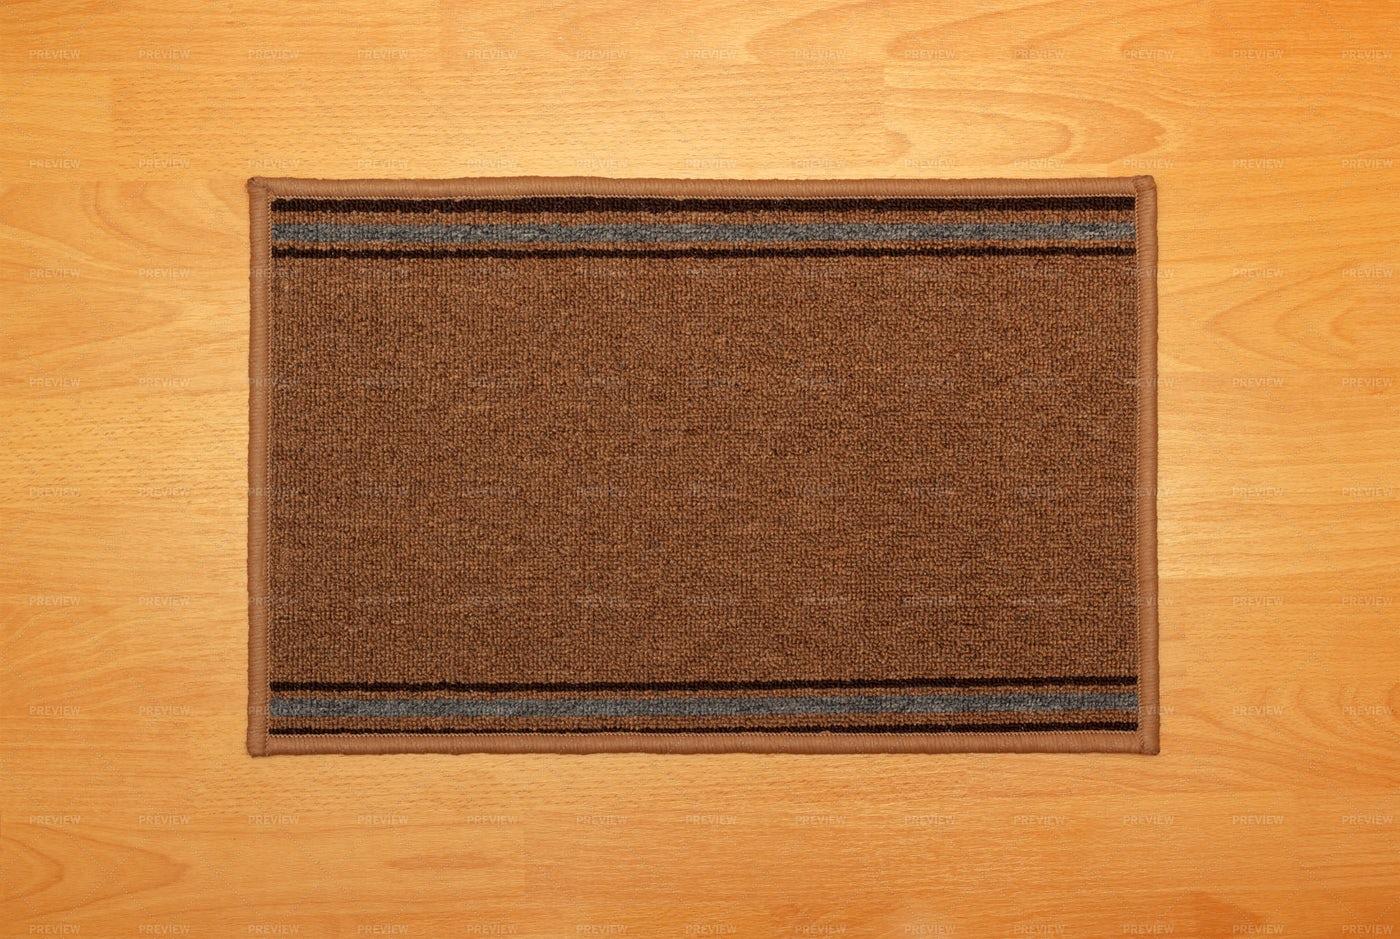 Rectangle Carpet On Floor: Stock Photos